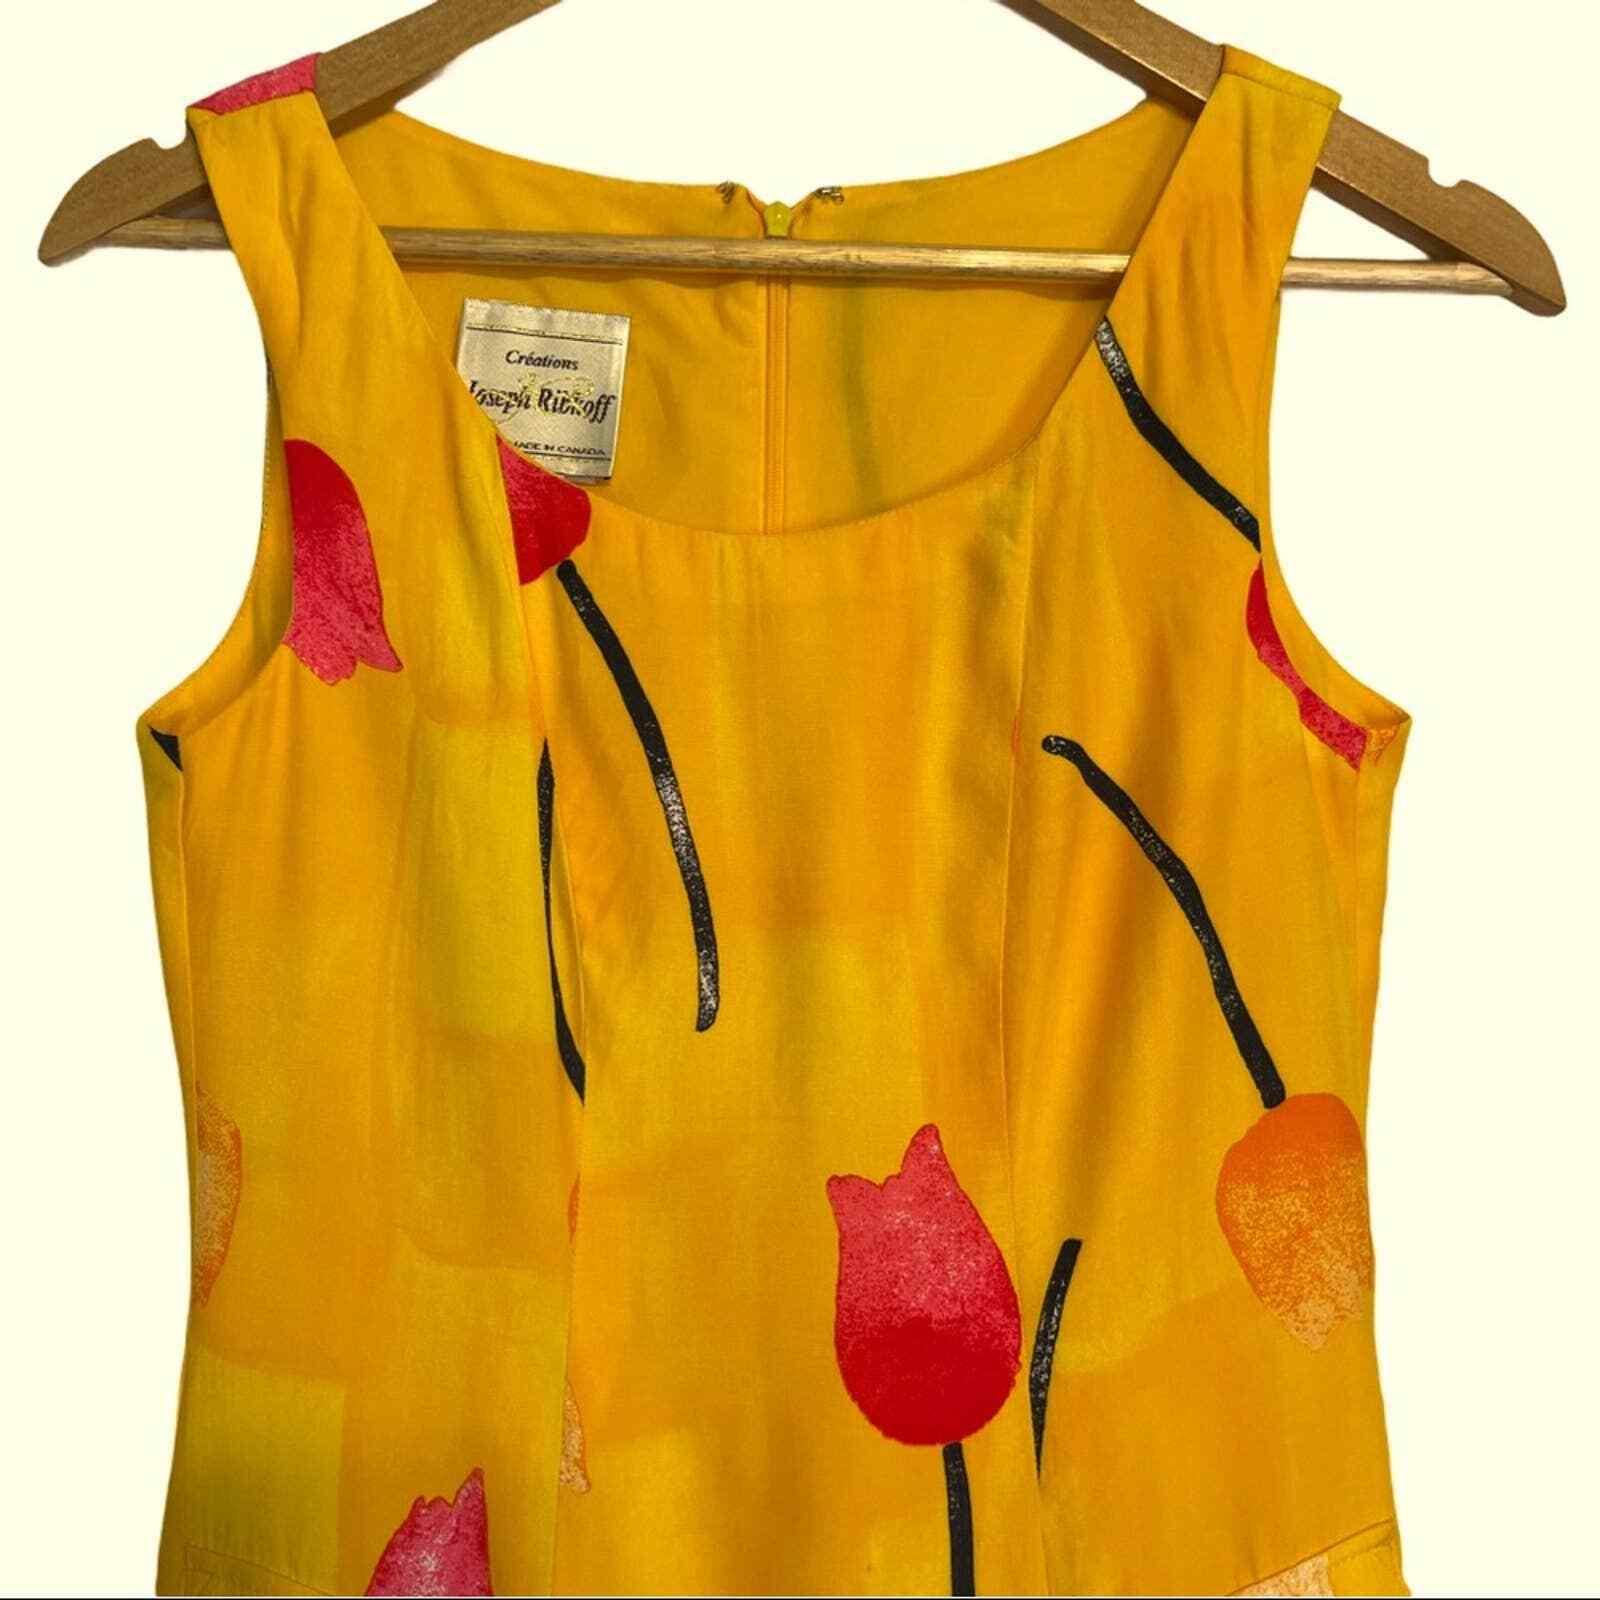 Joseph Ribkoff Tulip Print Sleeveless Sheath Dress - image 2